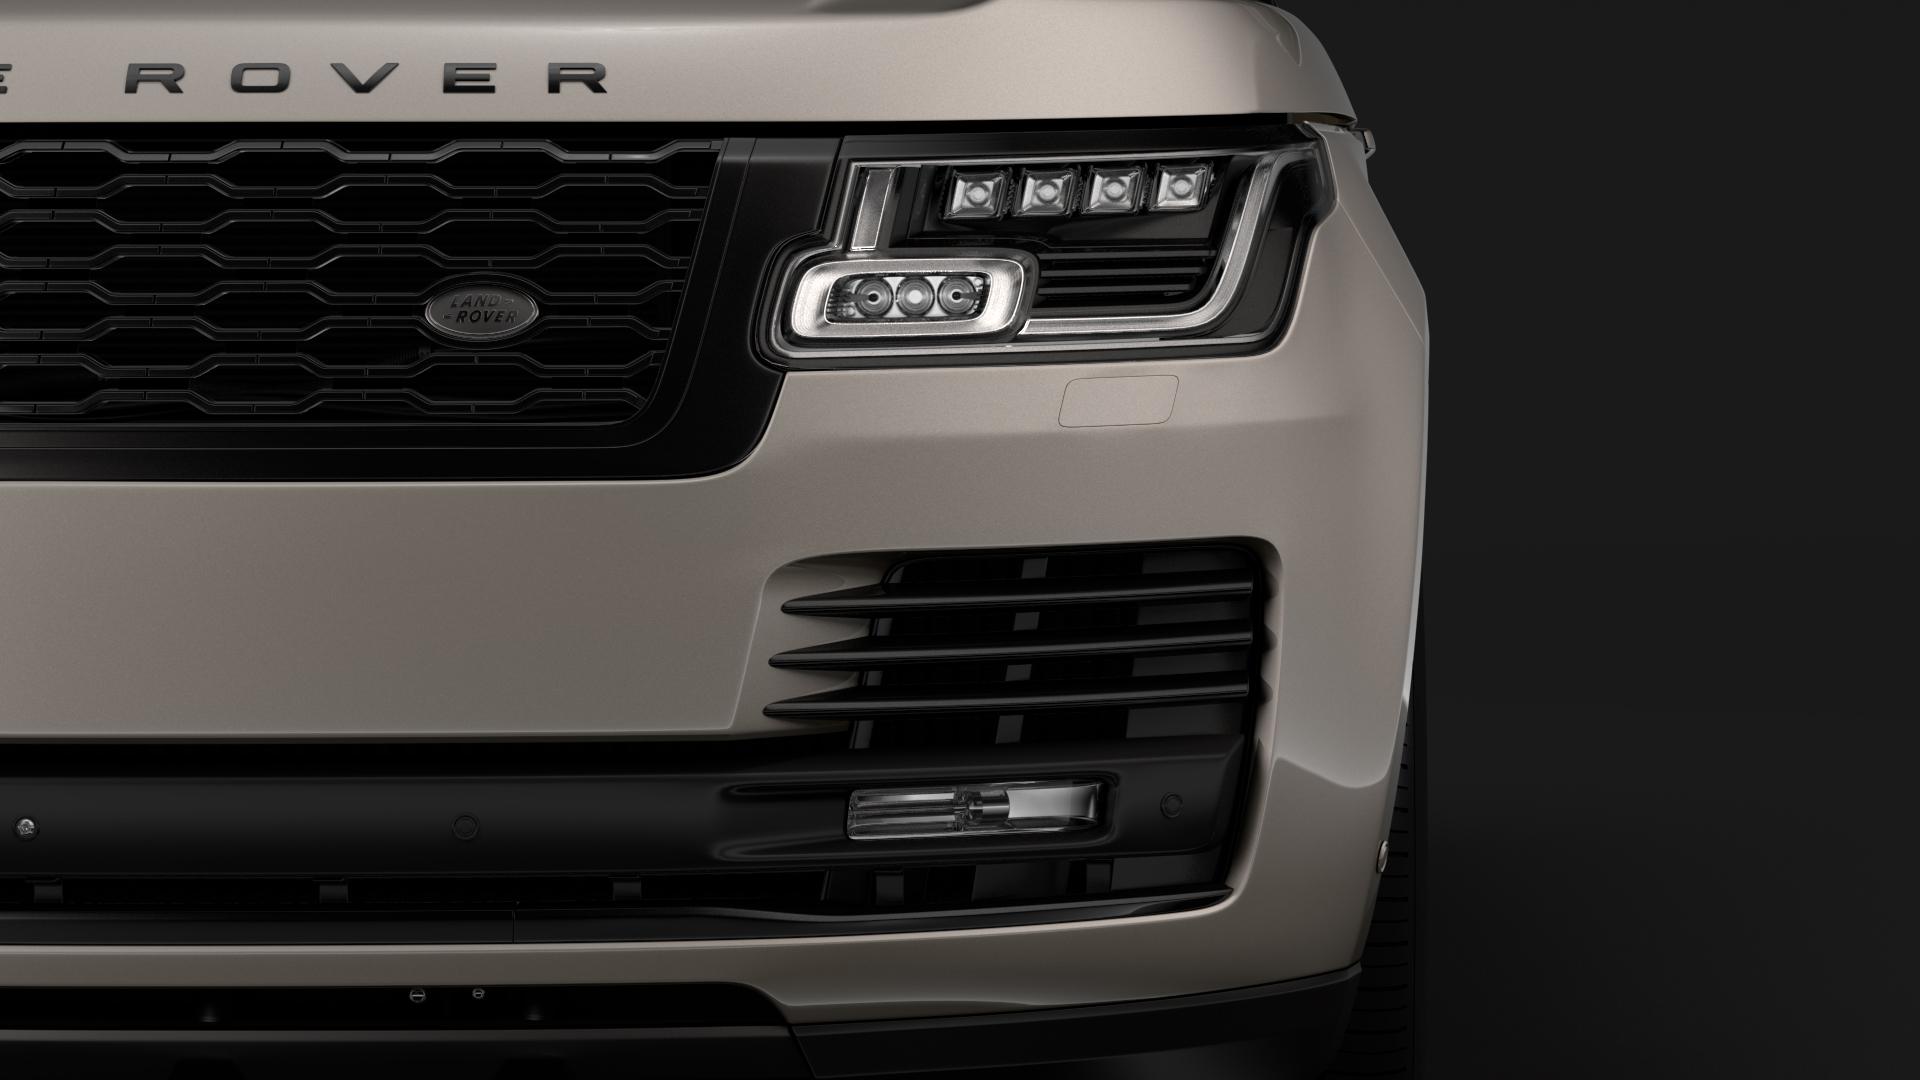 range rover autobiography hybrid (l405) 2018 3d model max fbx c4d lwo ma mb hrc xsi obj 278141